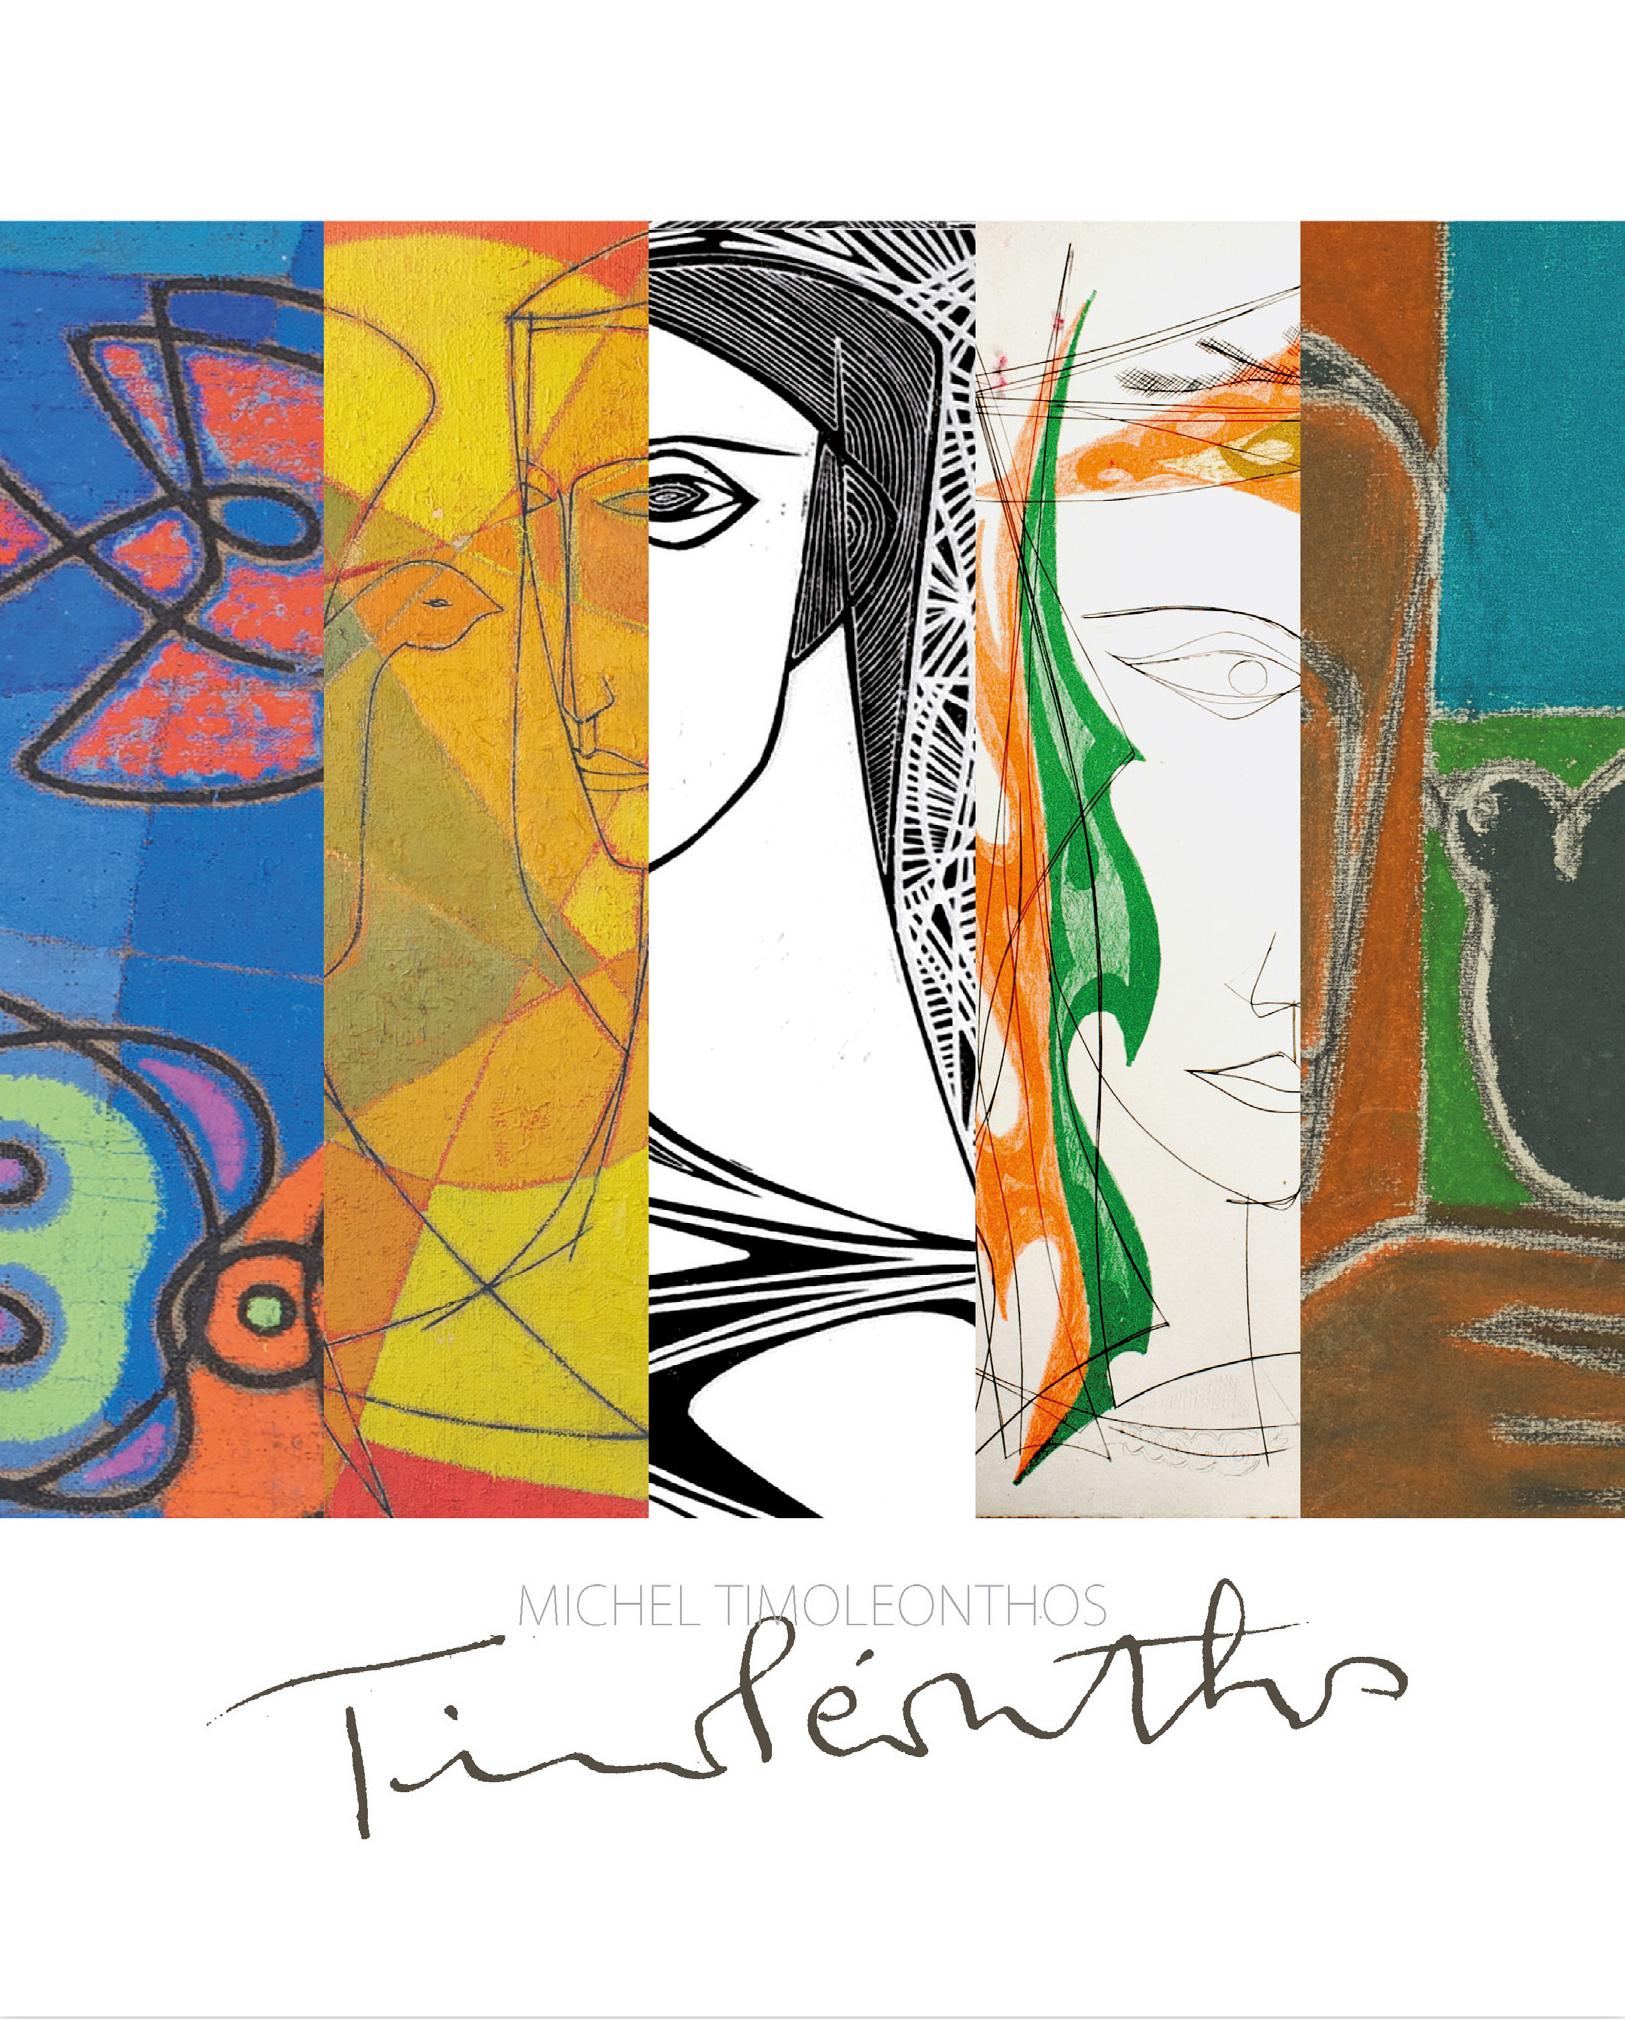 Livre-Timoleonthos 2015